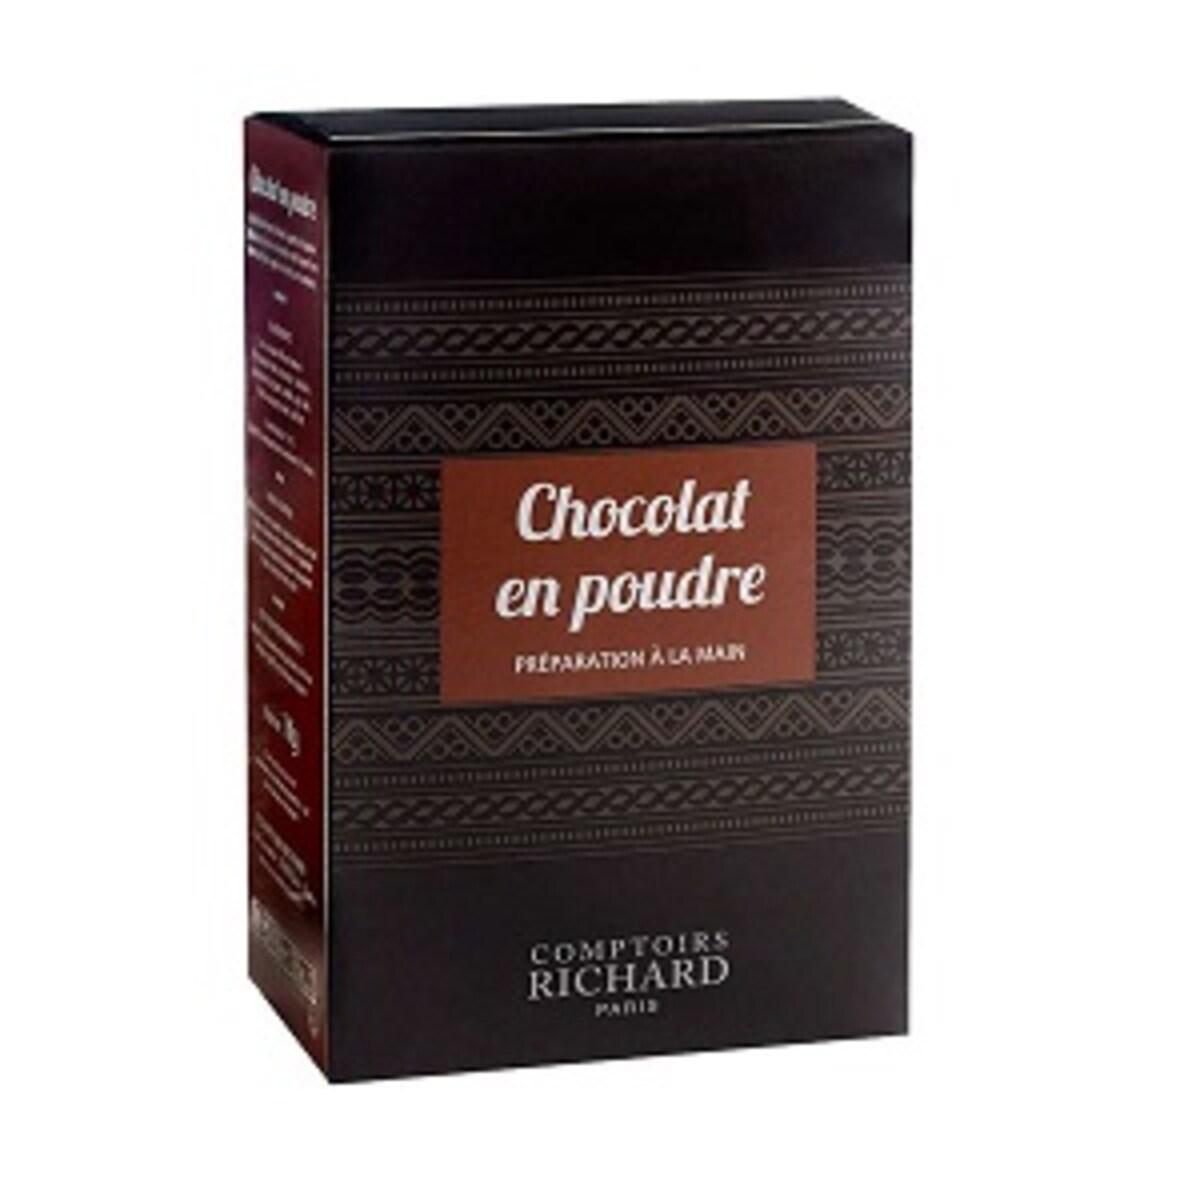 Cafés Richard Chocolat en poudre - 1кг горещ шоколад на прах